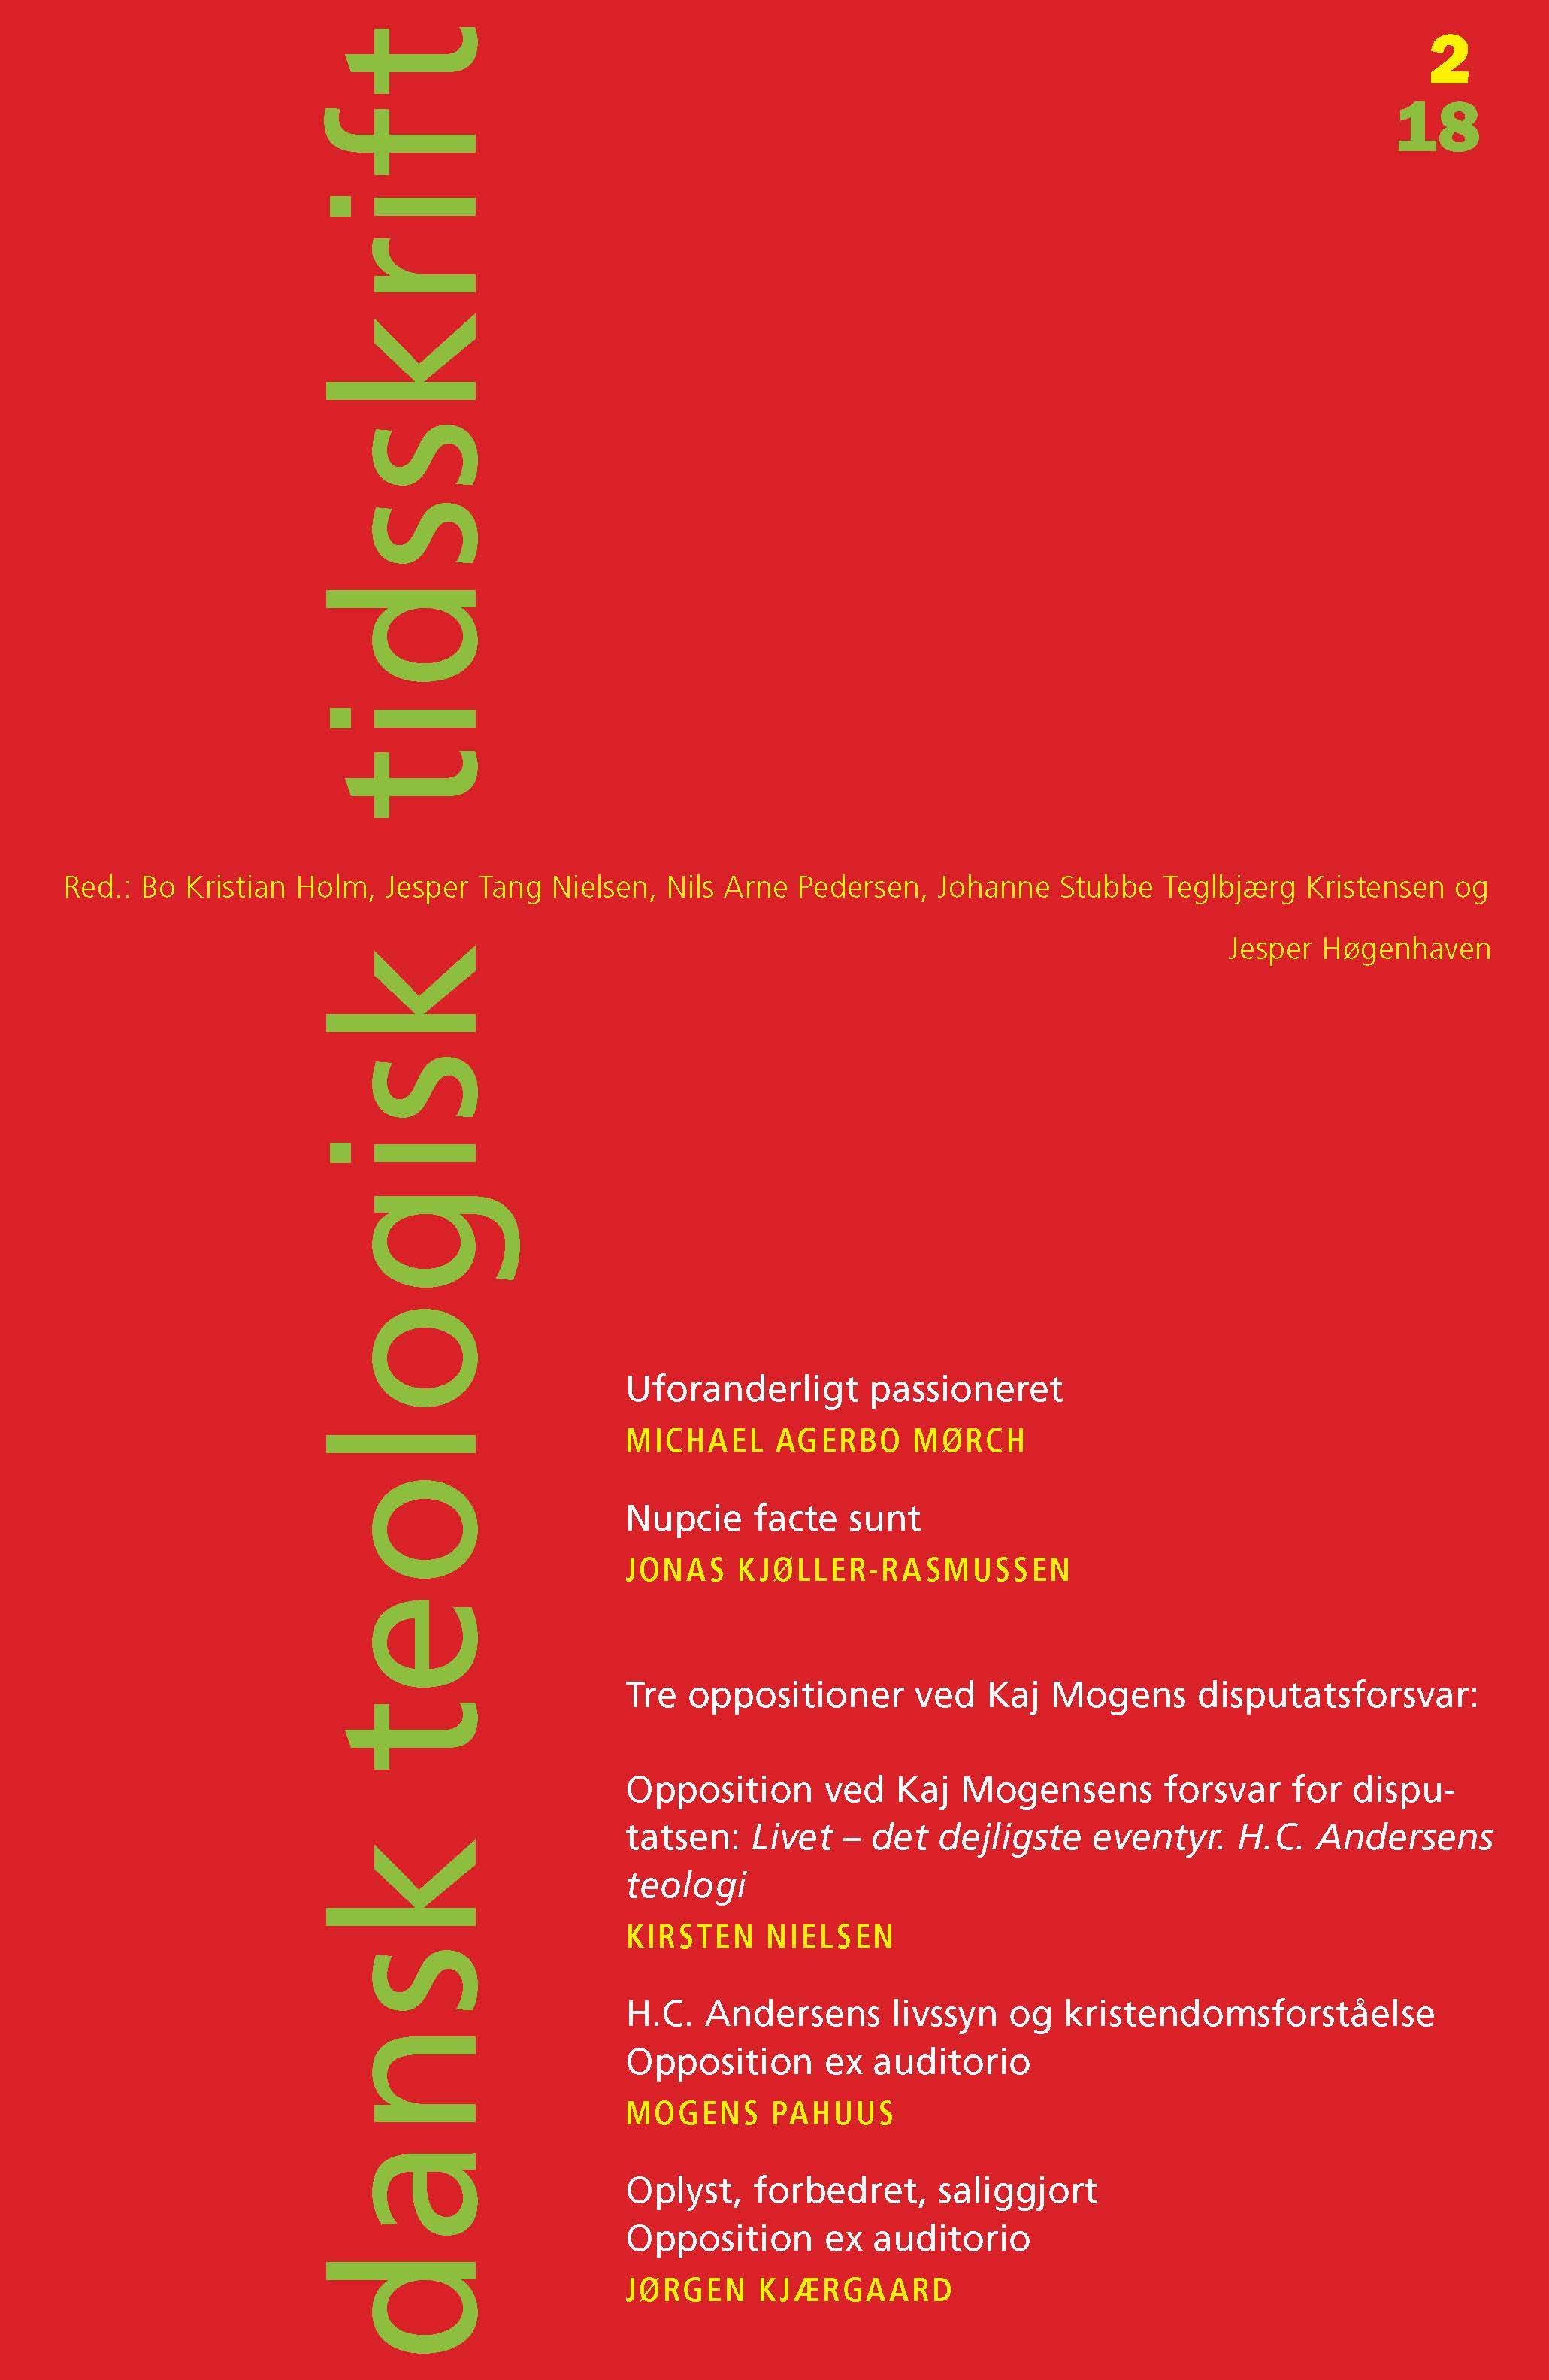 Dansk Teologisk Tidsskrift nr. 2, 2018